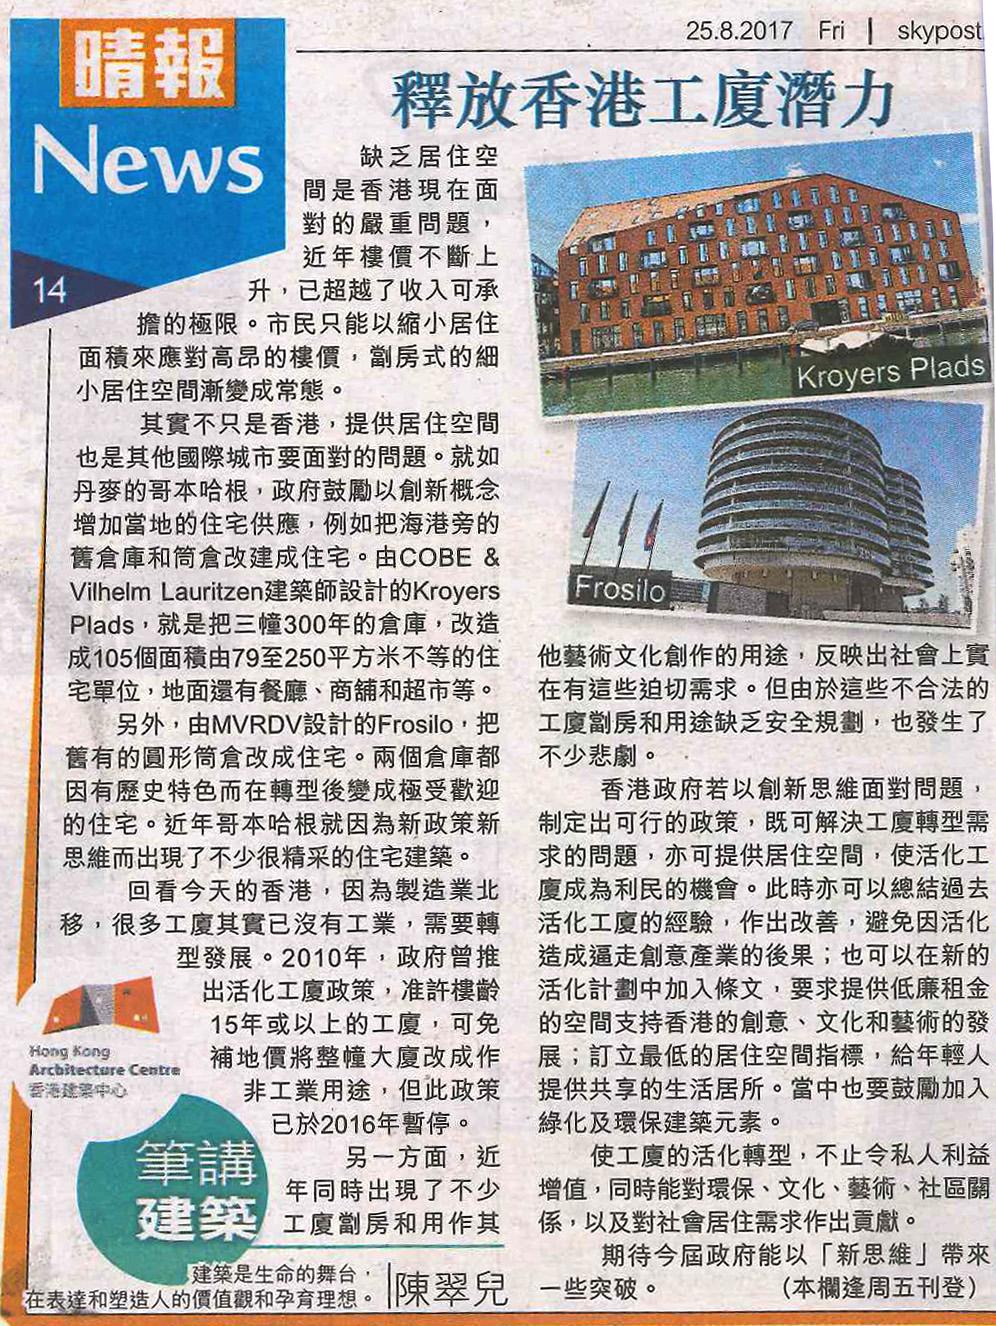 Skypost_170825_陳翠兒_釋放香港工廈潛力.jpg